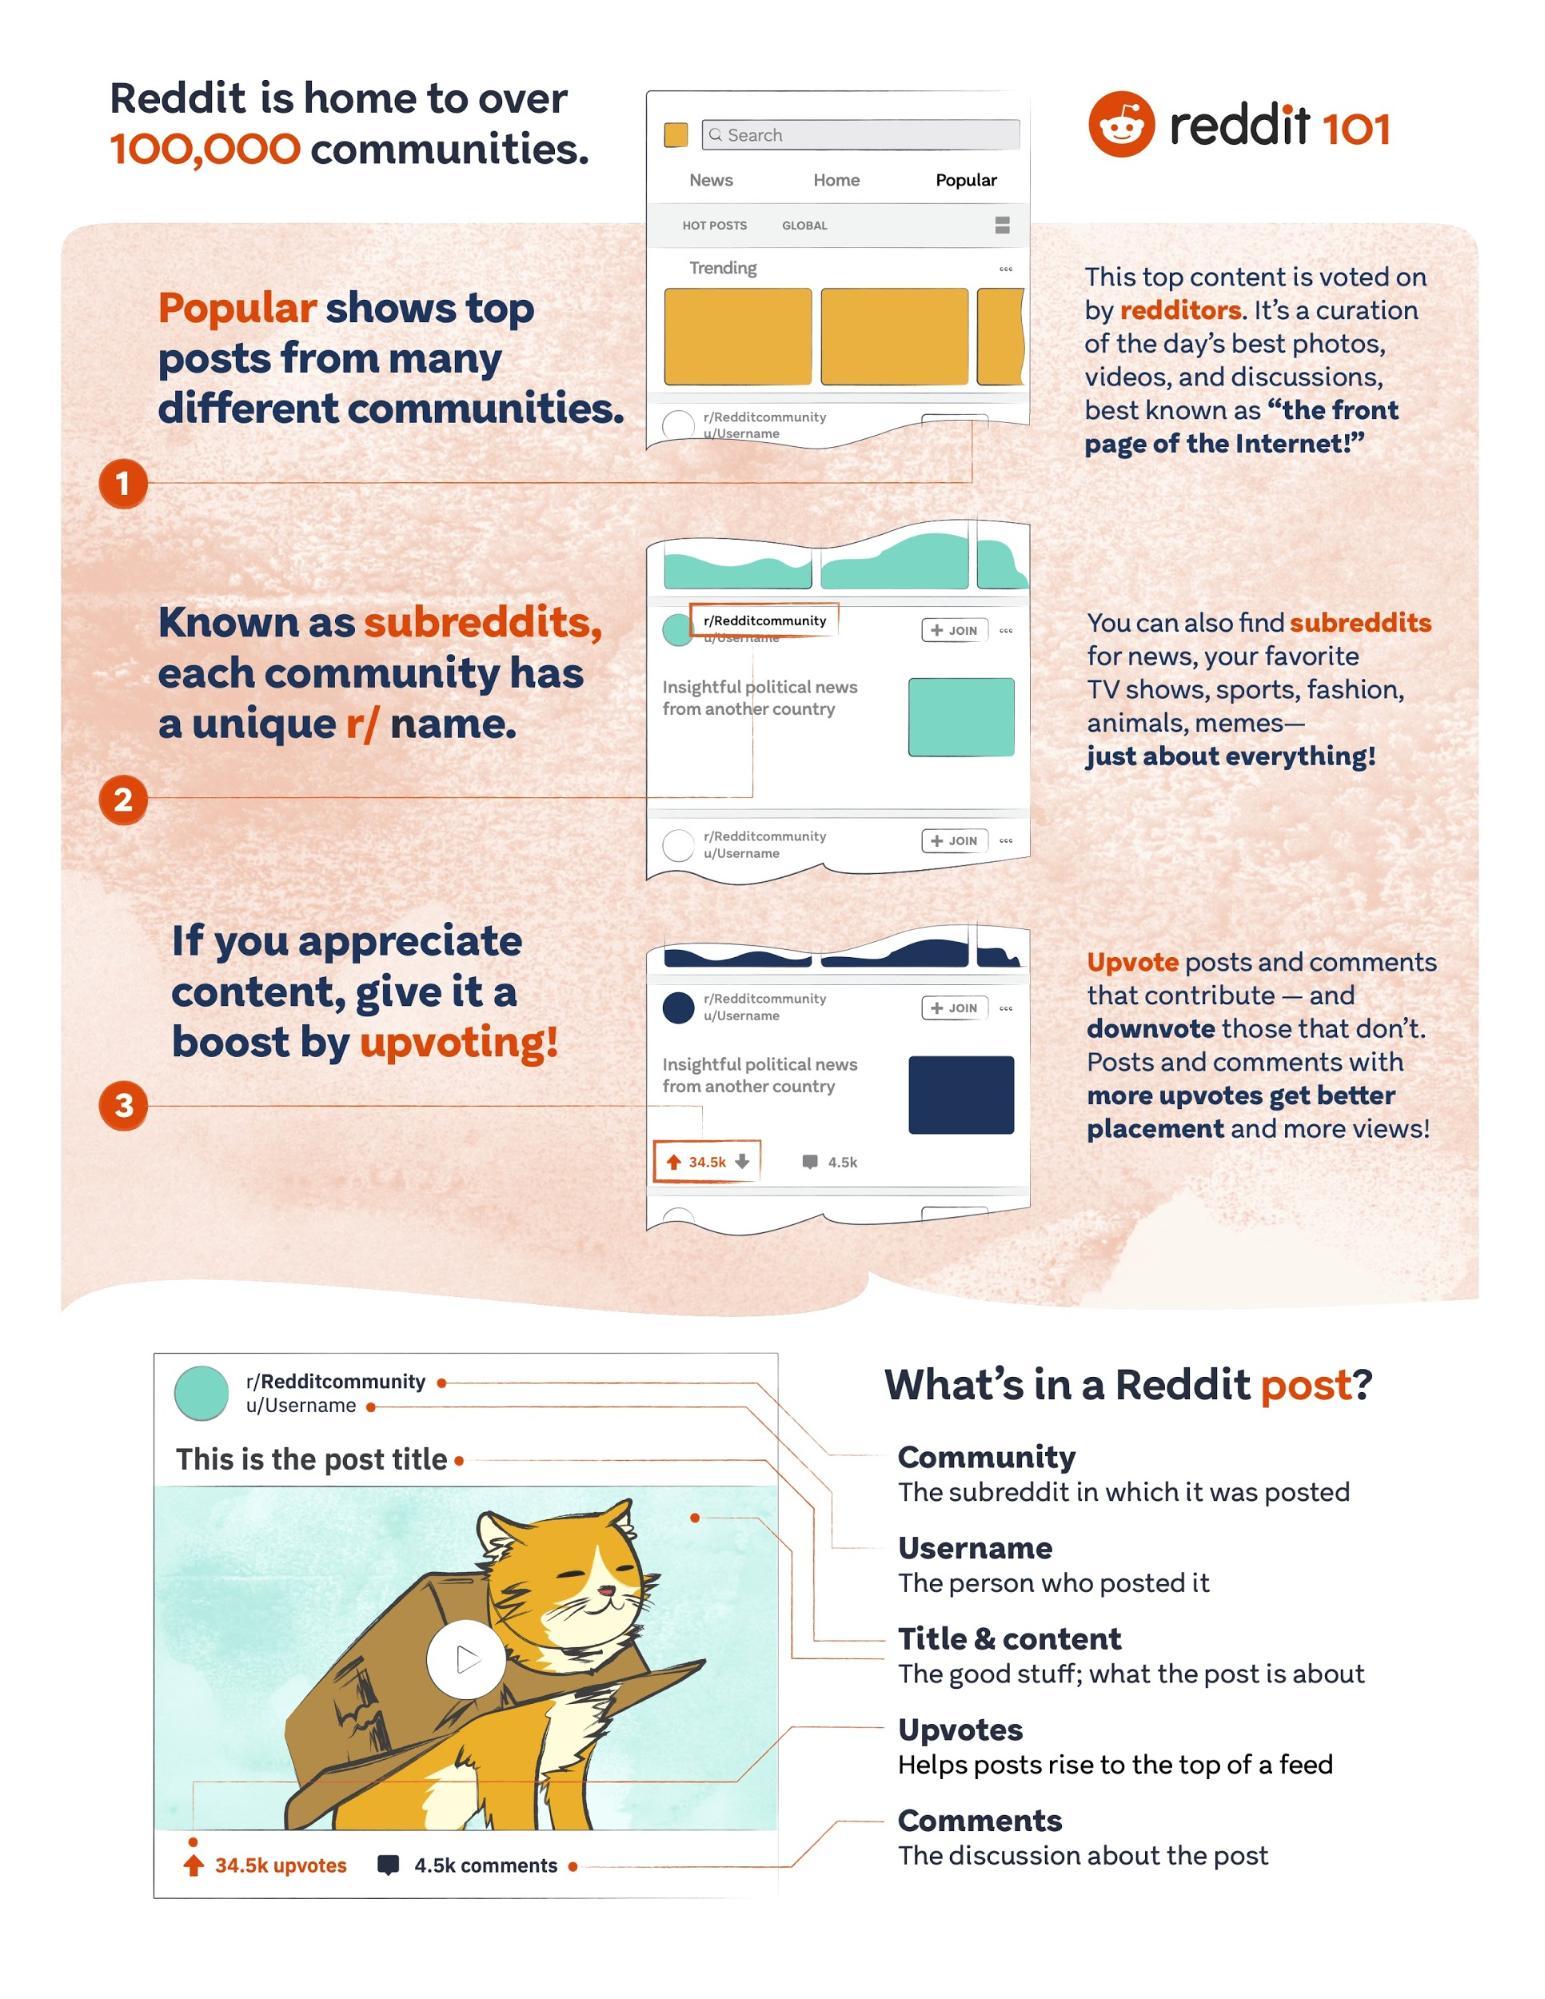 Reddit 101 Brand Guidelines Example